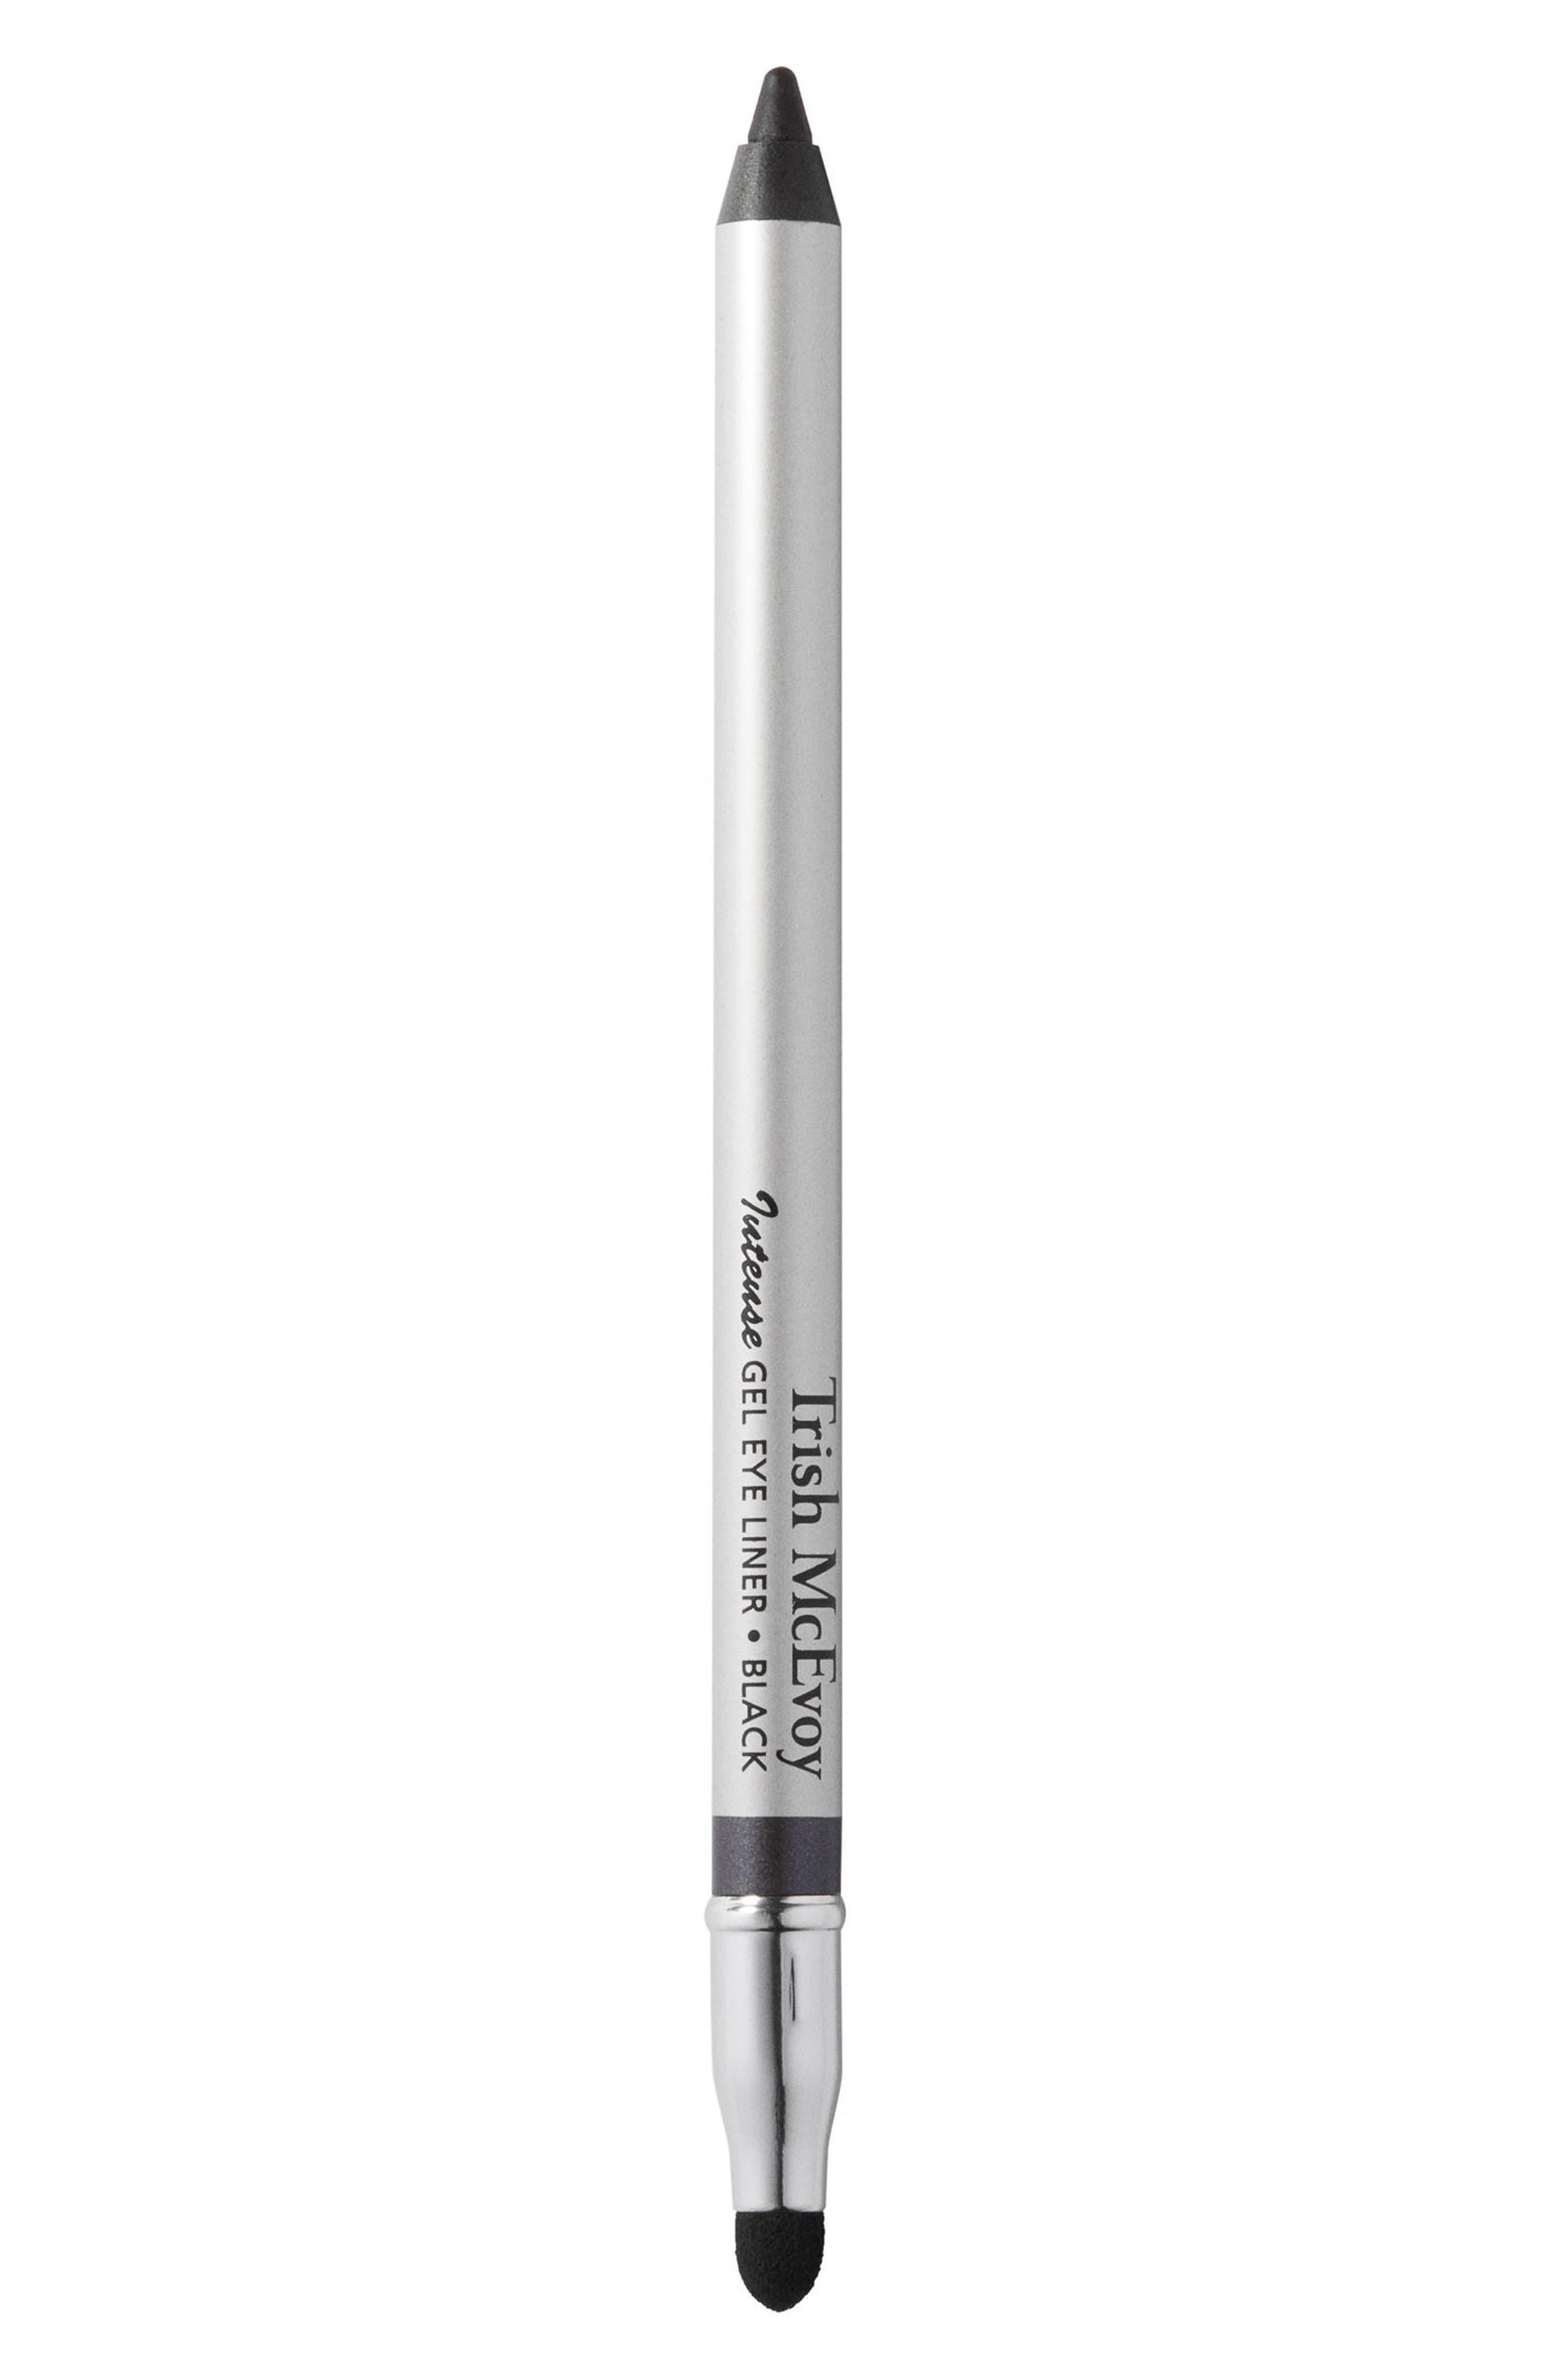 Intense Gel Eyeliner Pencil,                             Main thumbnail 1, color,                             BLACK